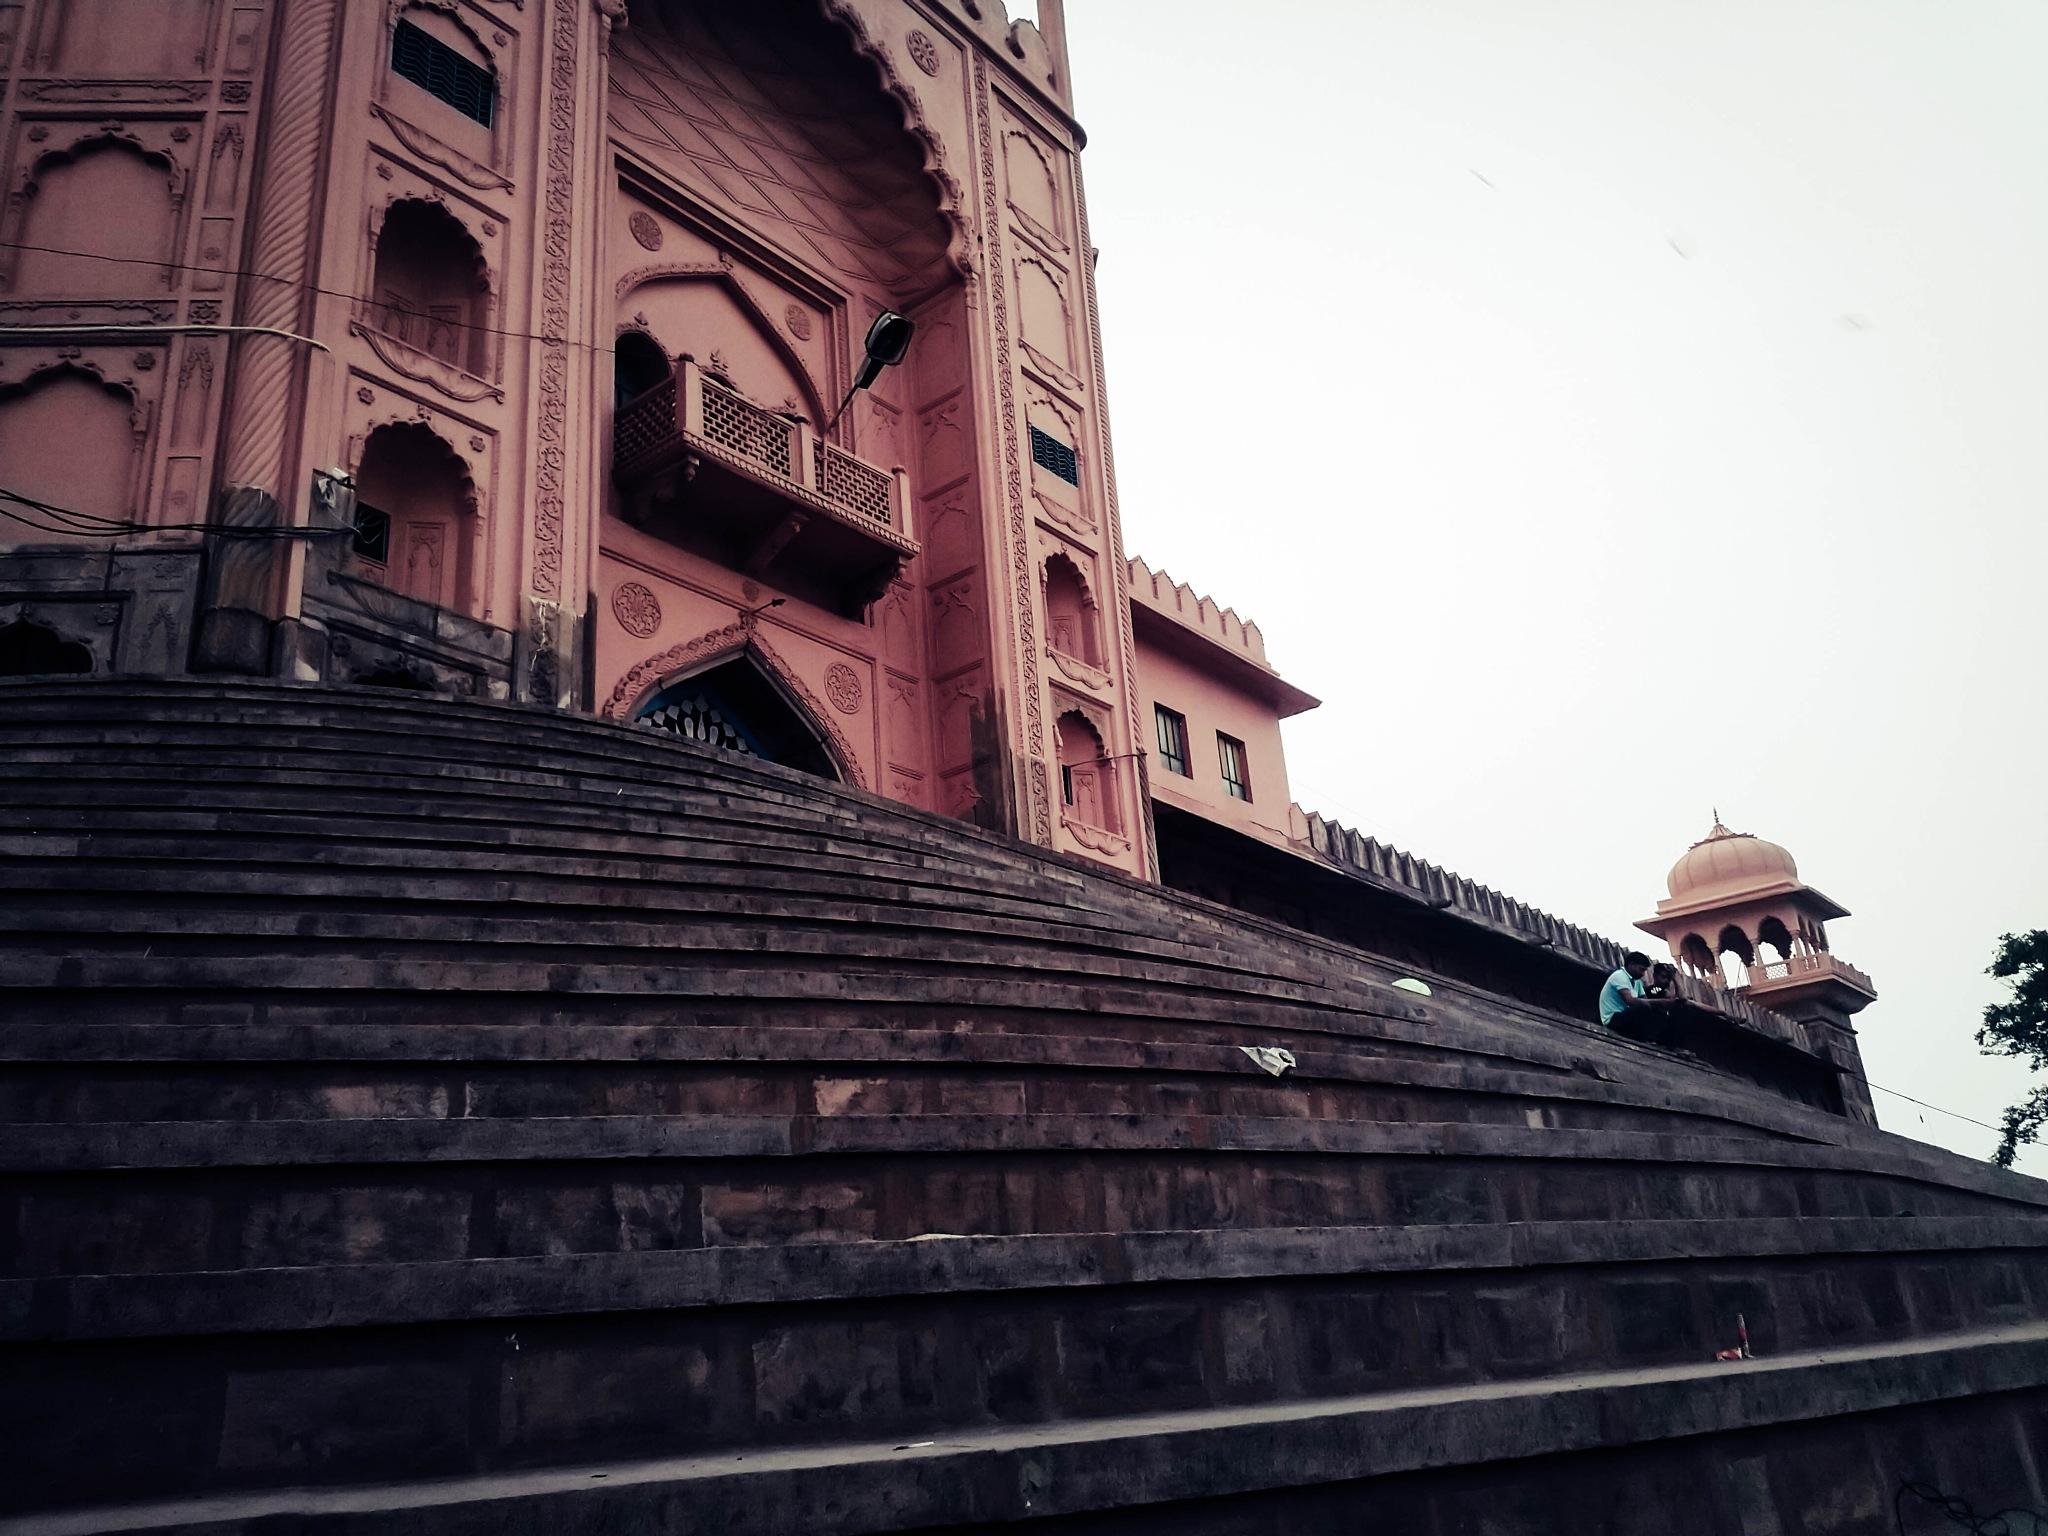 Taj-ul-Masjid_BHOPAL,INDIA by Anmol Vishwakarma